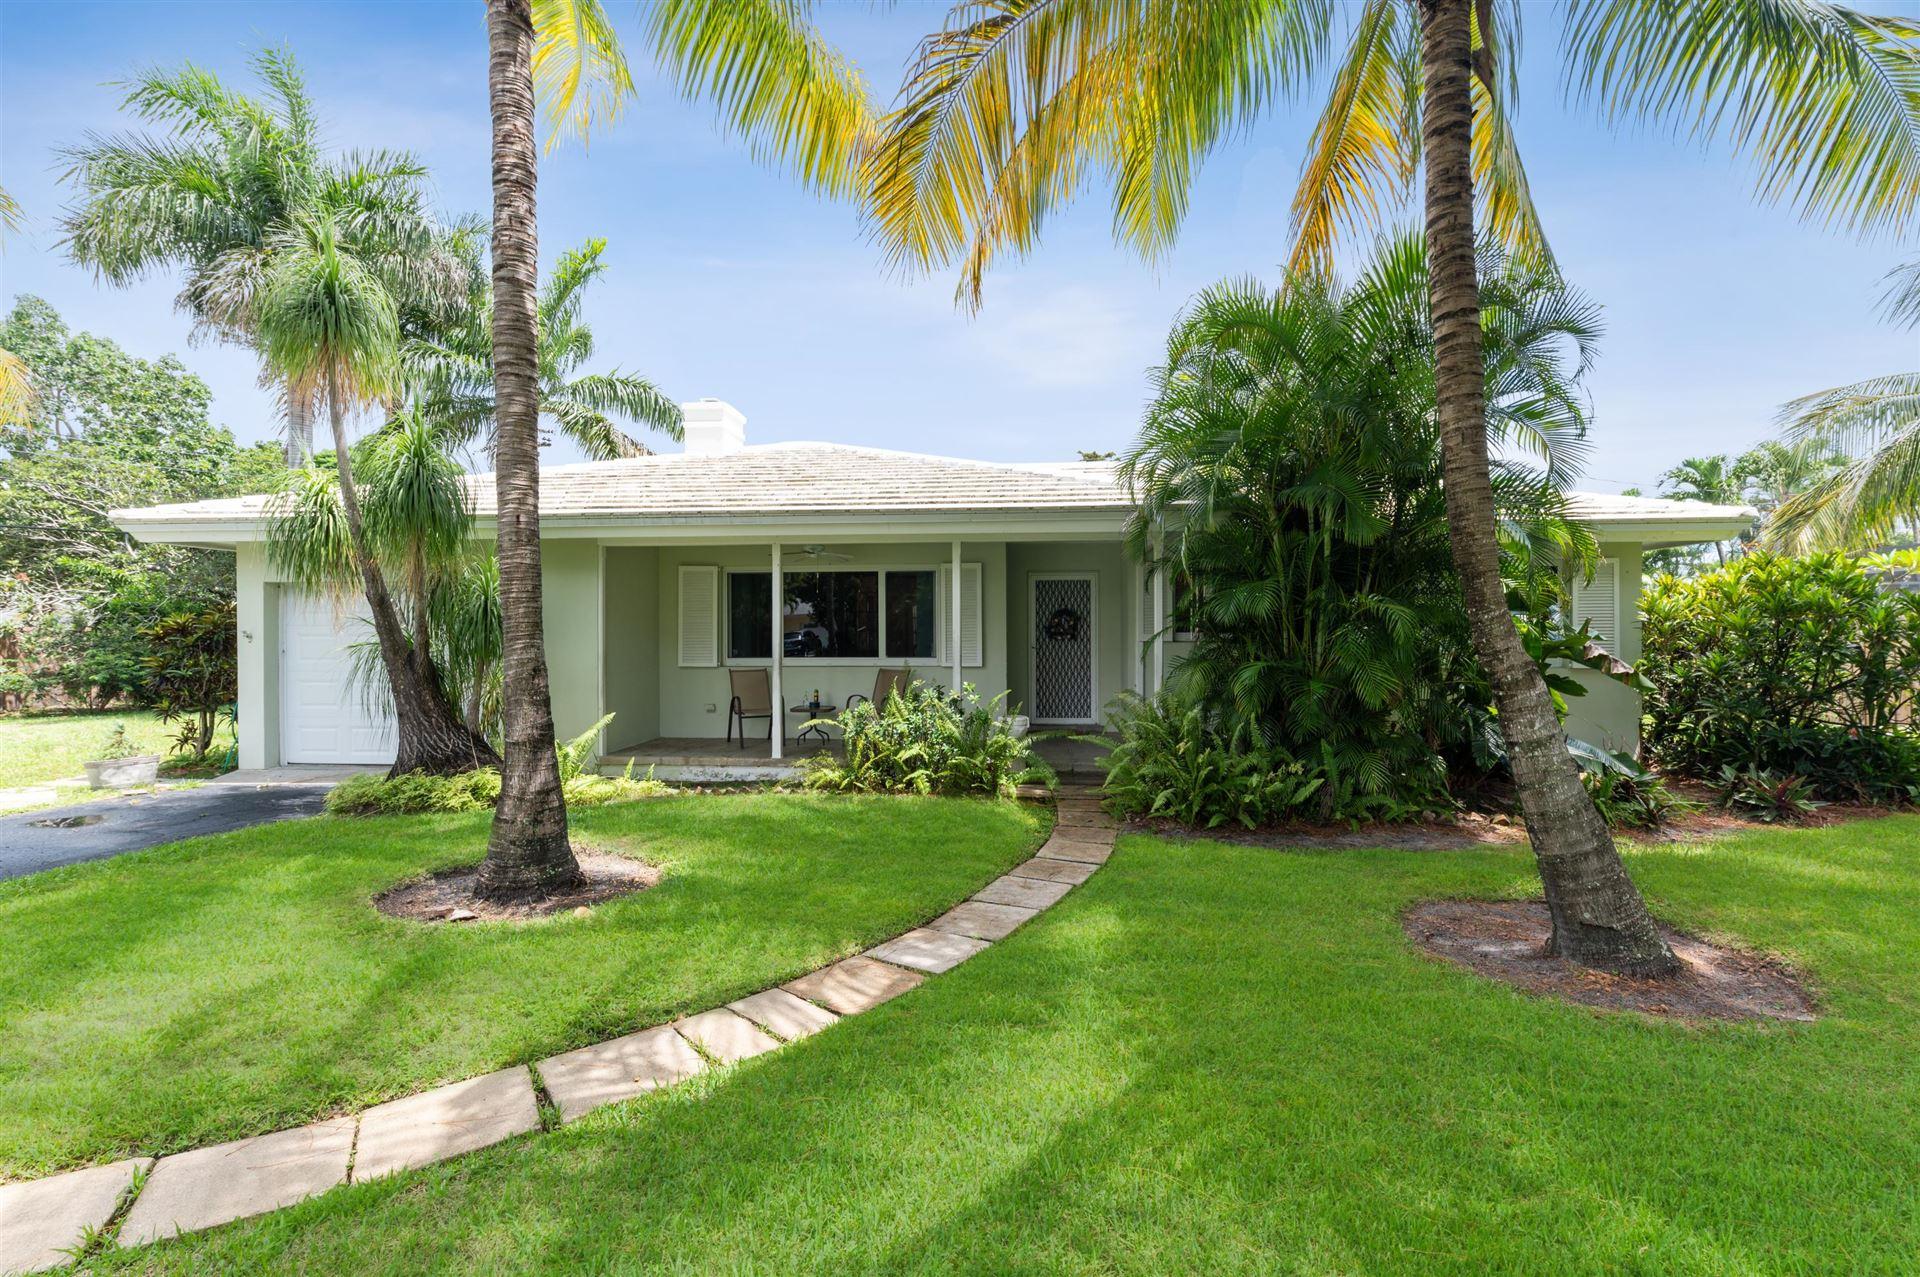 605 Sunset Road, Boynton Beach, FL 33435 - #: RX-10640180